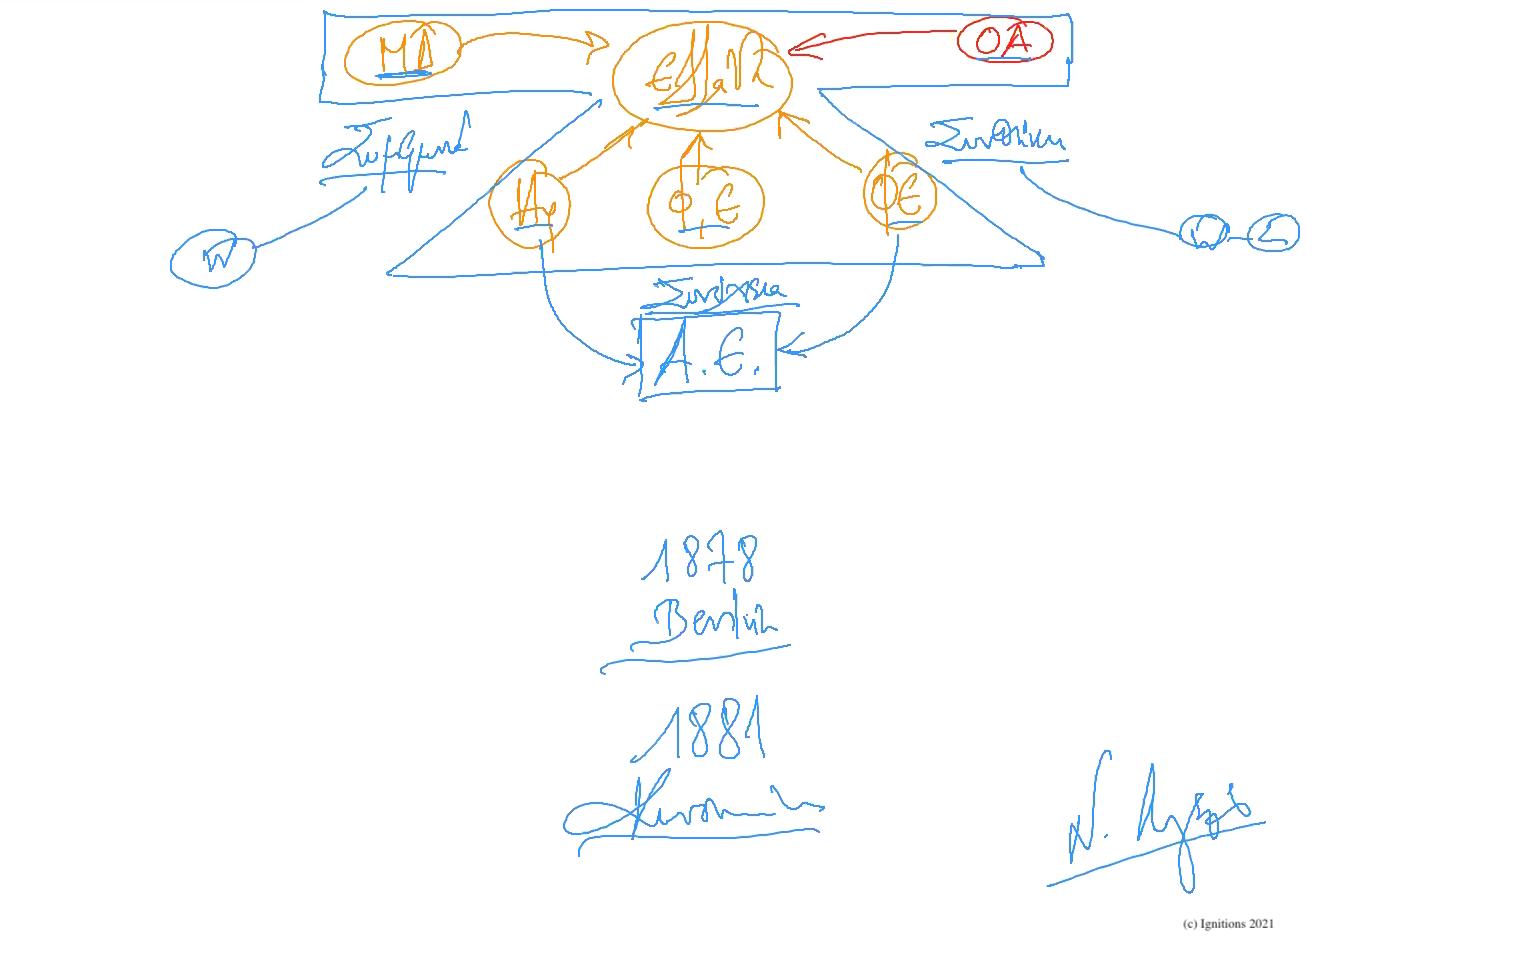 59004 - IV -Η συμβολή του Φιλελληνισμού στην στρατηγική θεμελίωση της Ελλάδας. (Dessin)